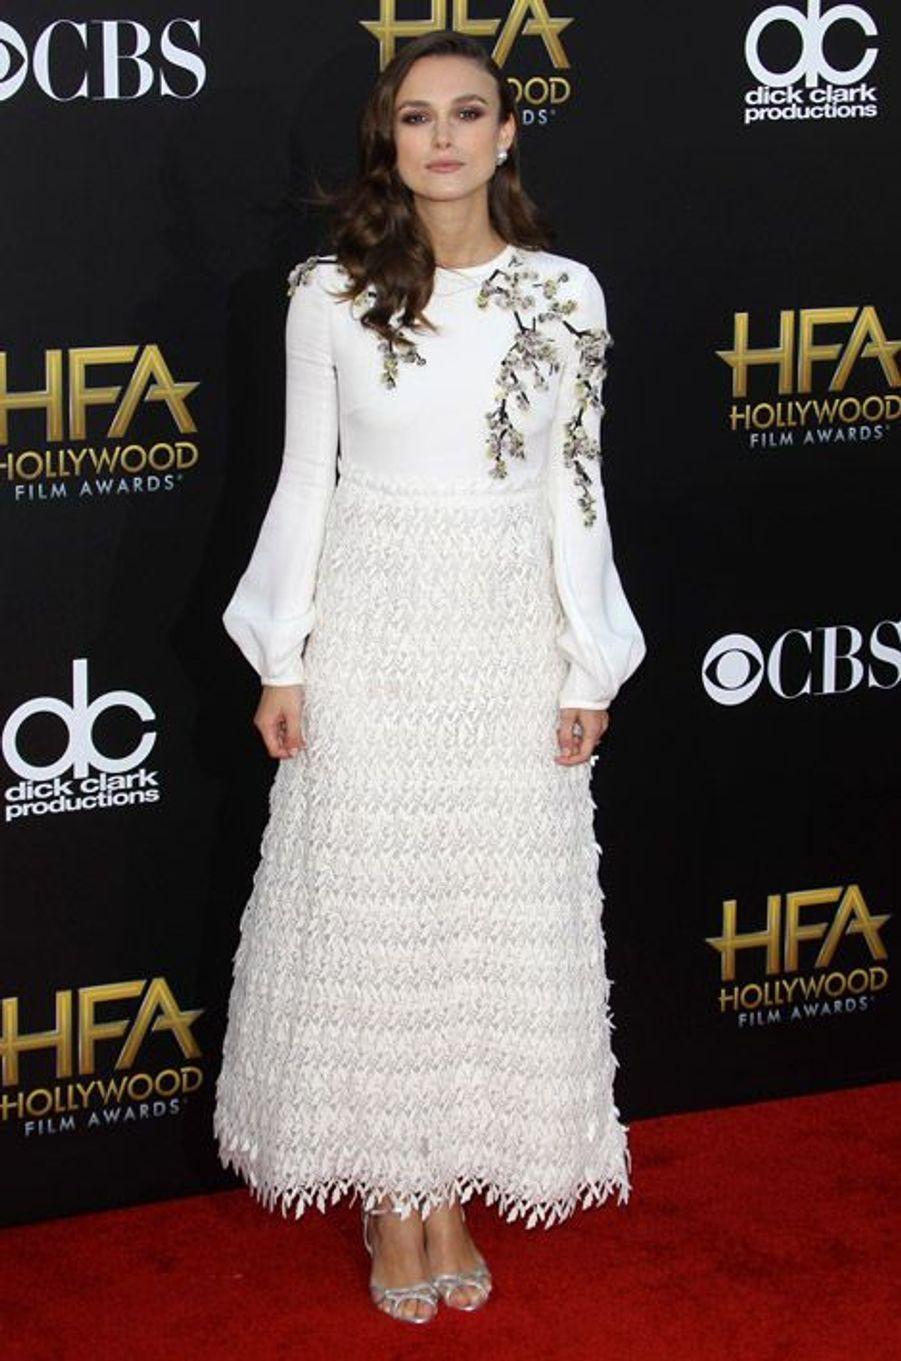 L'actrice Keira Knightley en Giambattista Valli lors de la cérémonie Hollywood film Awards, à Los Angeles le 15 novembre 2014